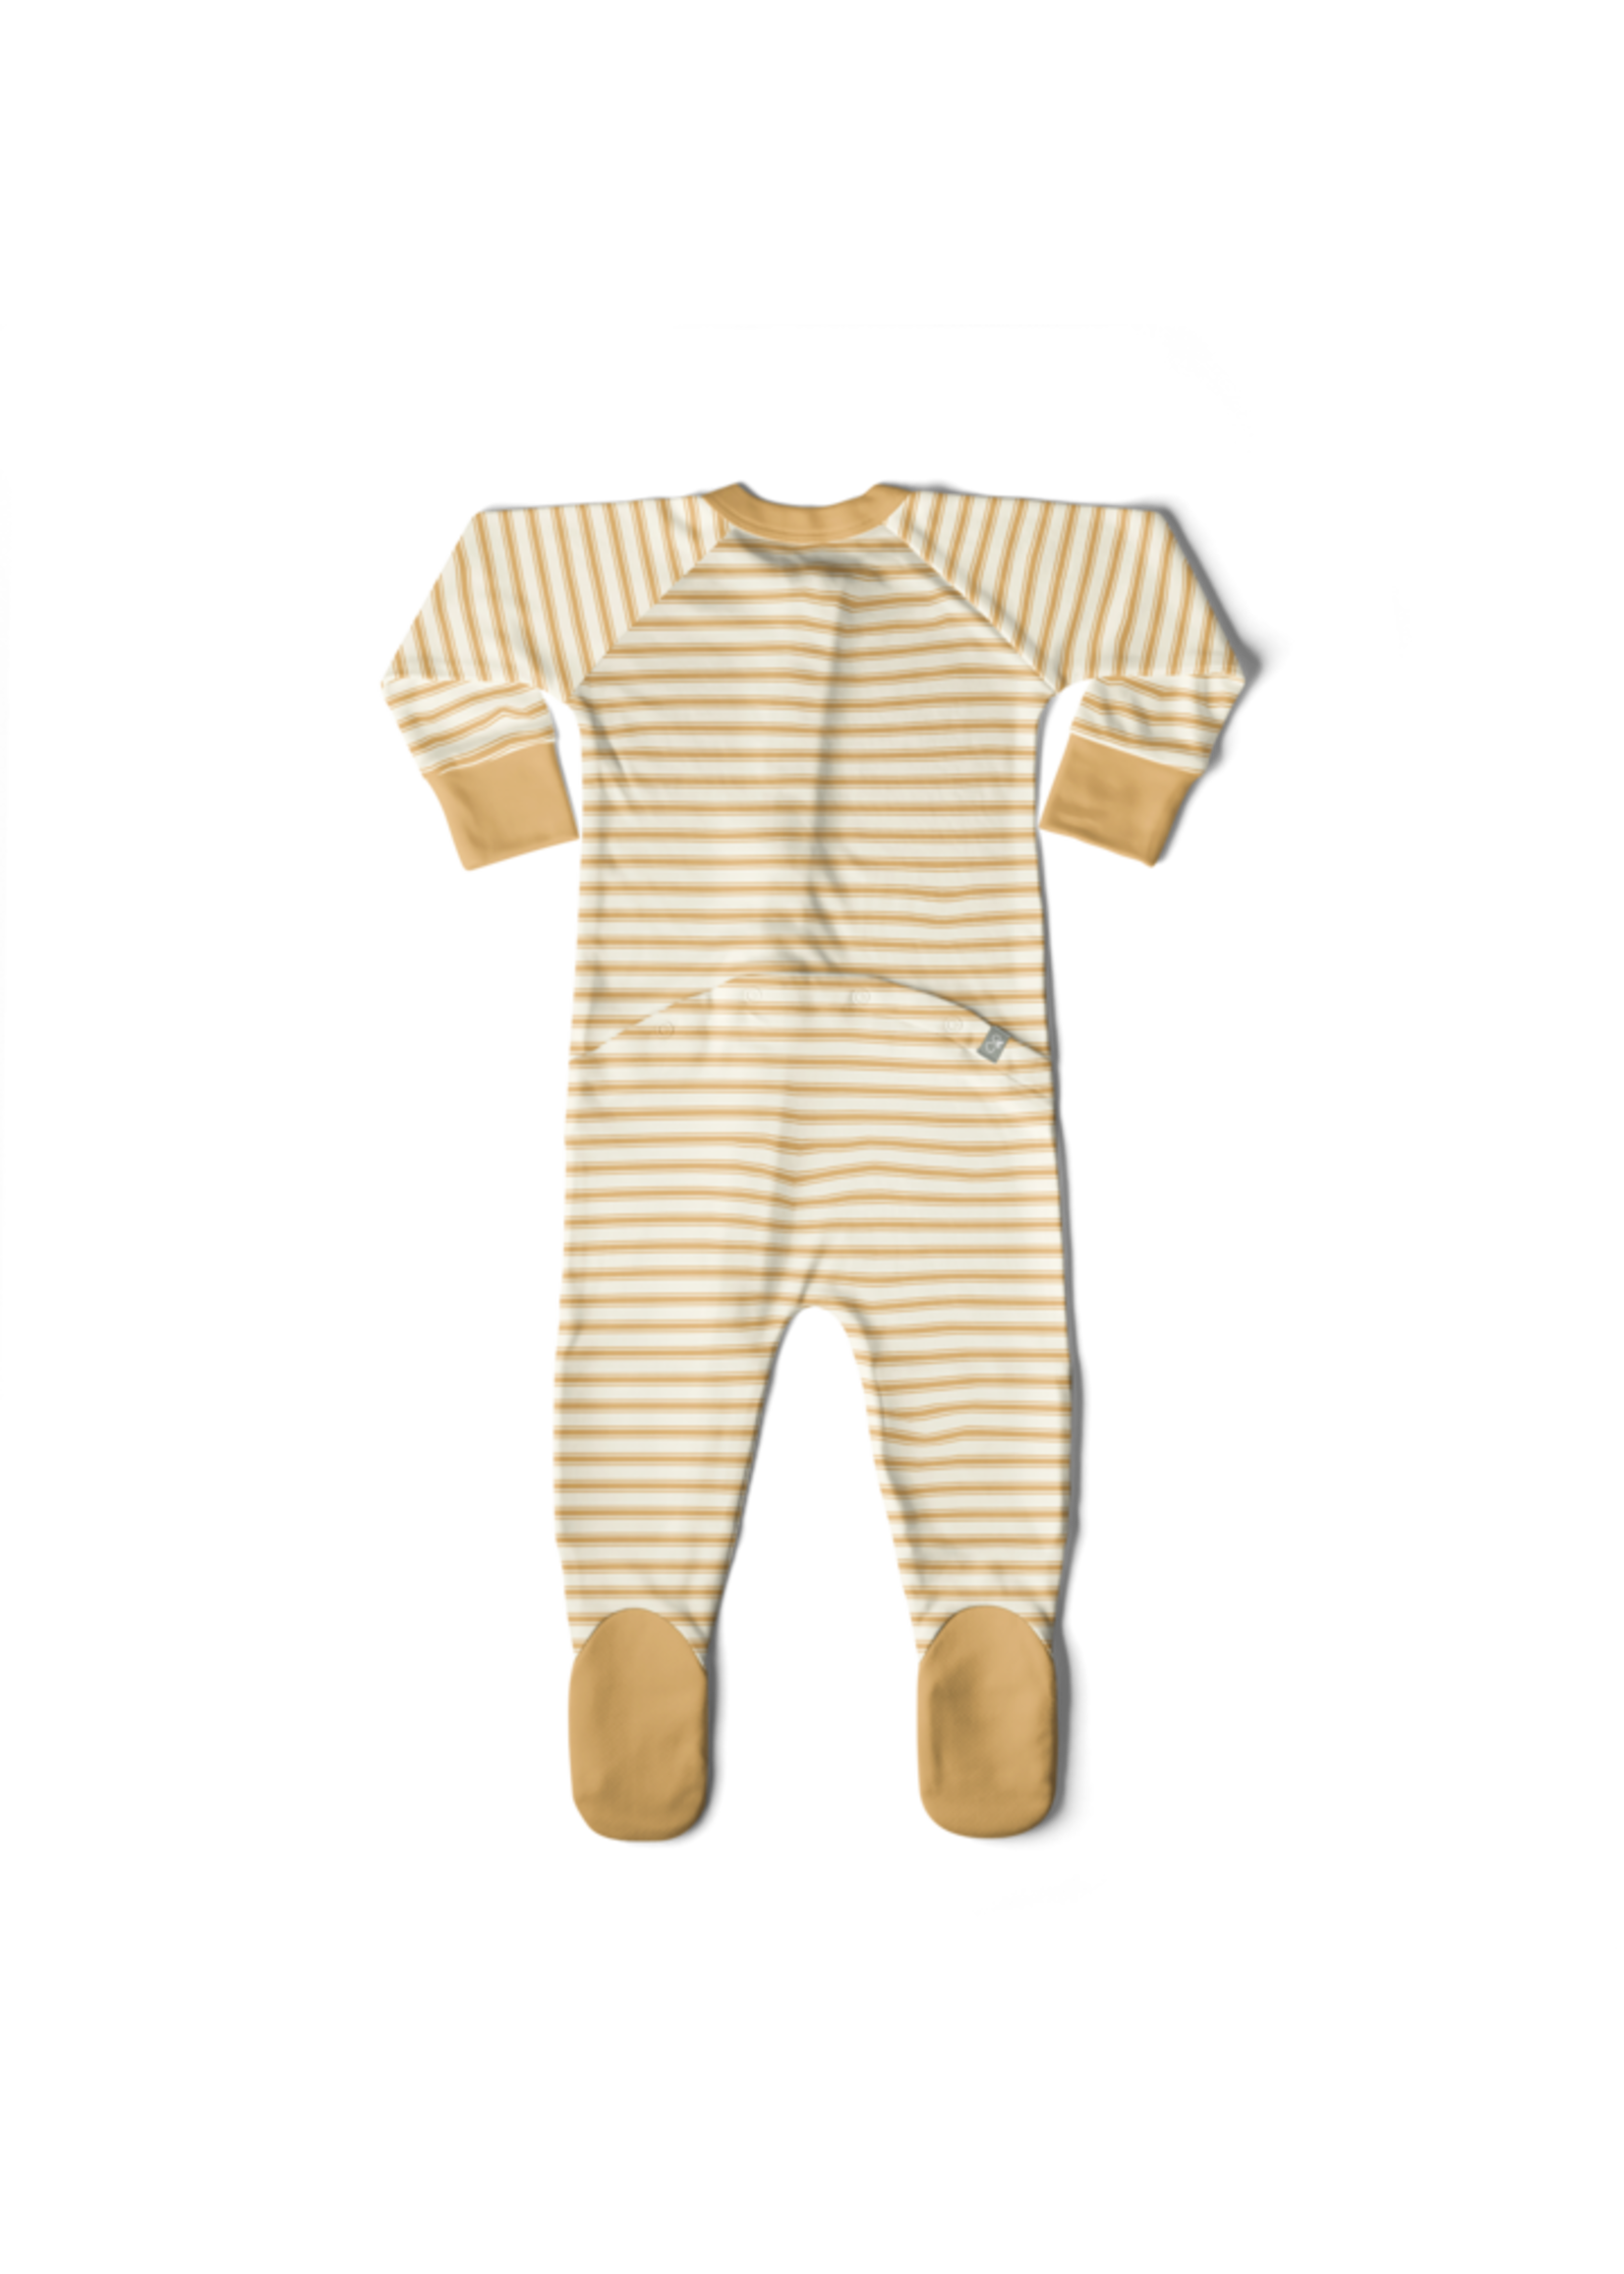 Goumi Kids Goumikids Footie - Sun Stripe 18-24m